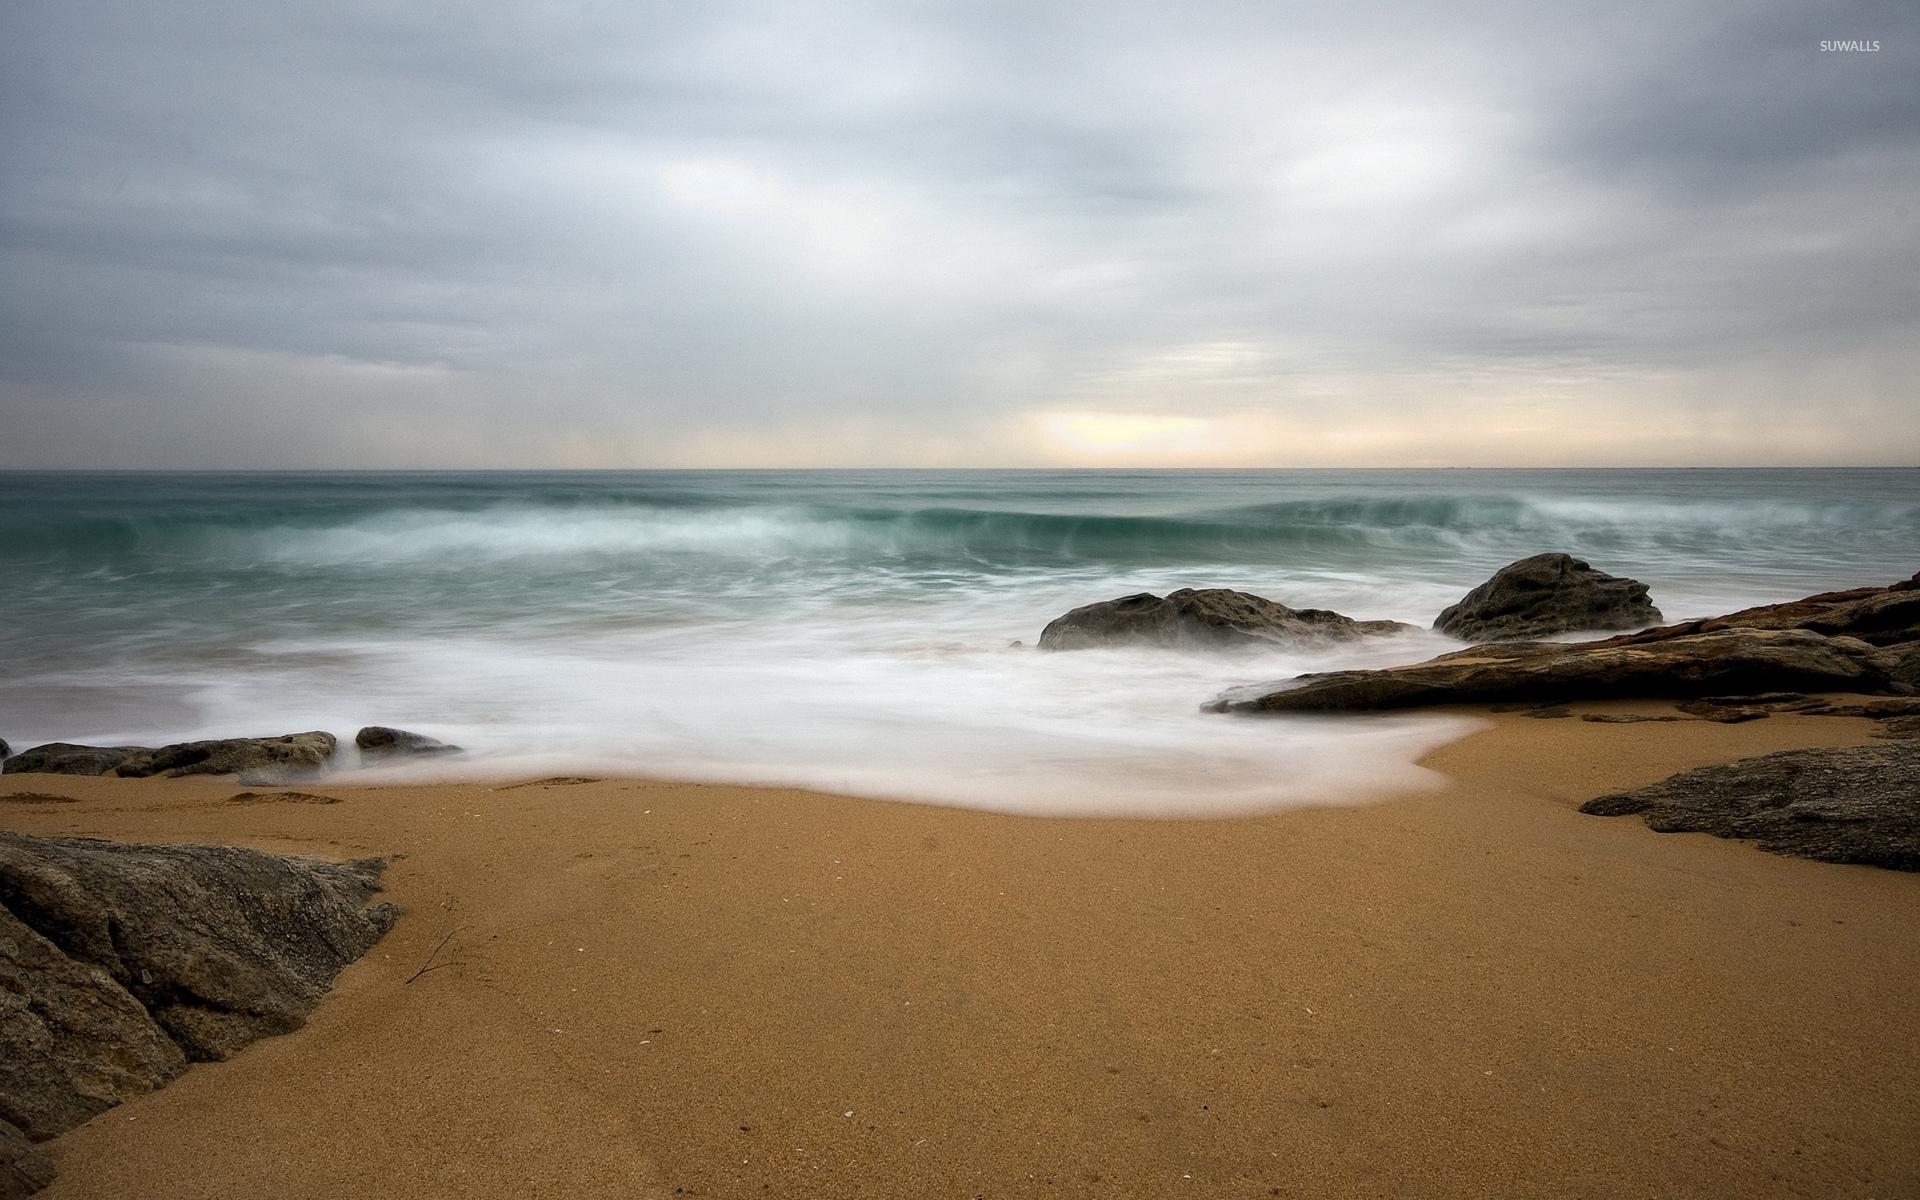 Sandy Beach Wallpaper: Waves Resting On The Sandy Beach Wallpaper